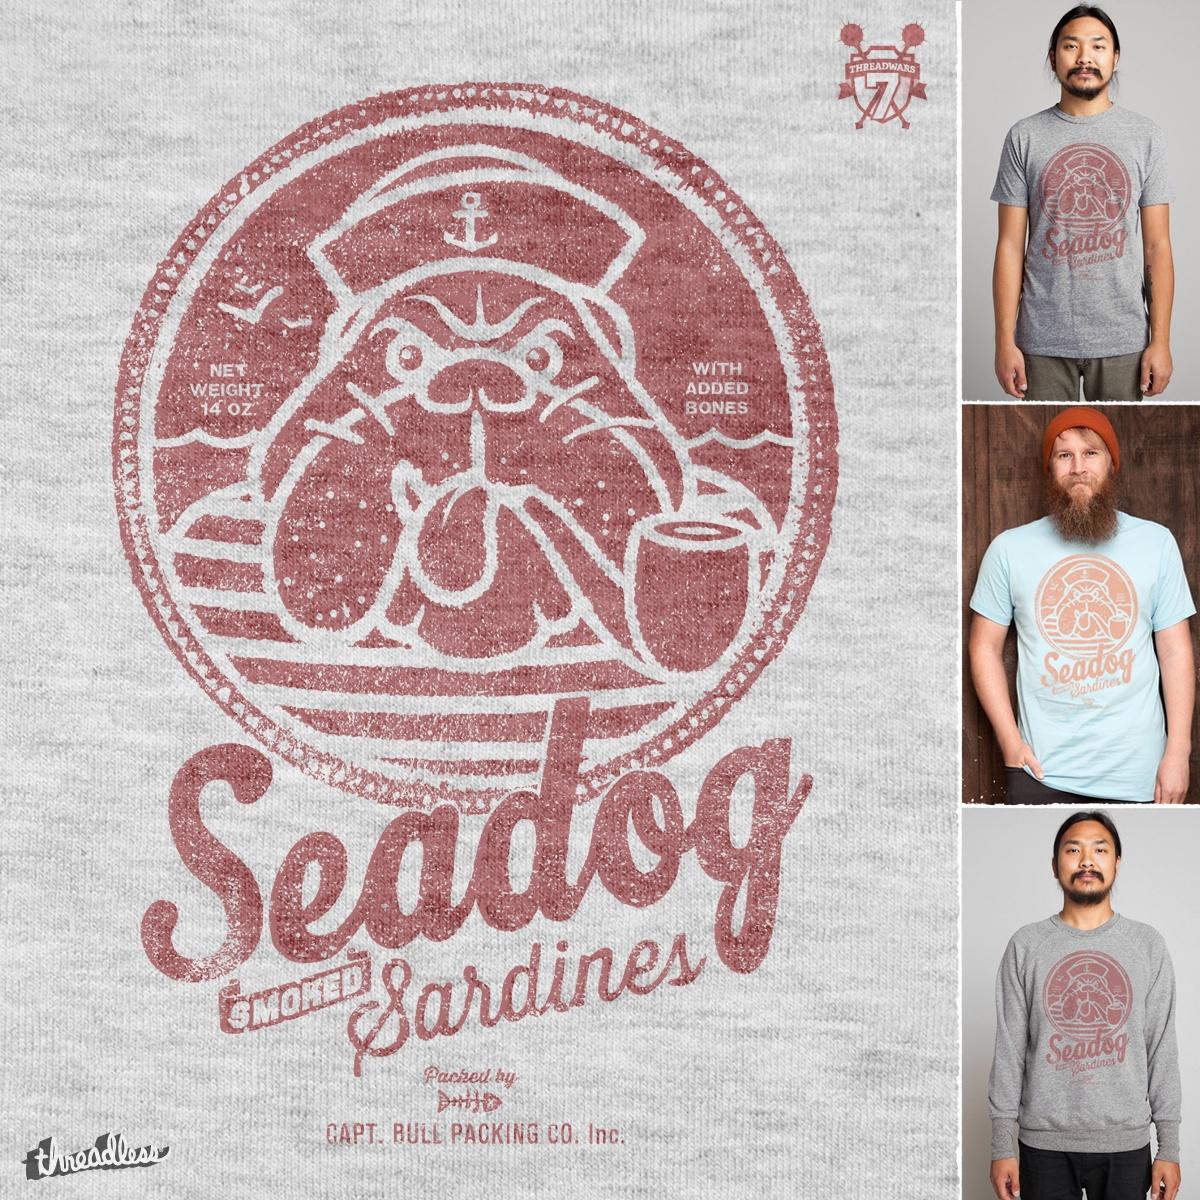 Seadog by v_calahan on Threadless